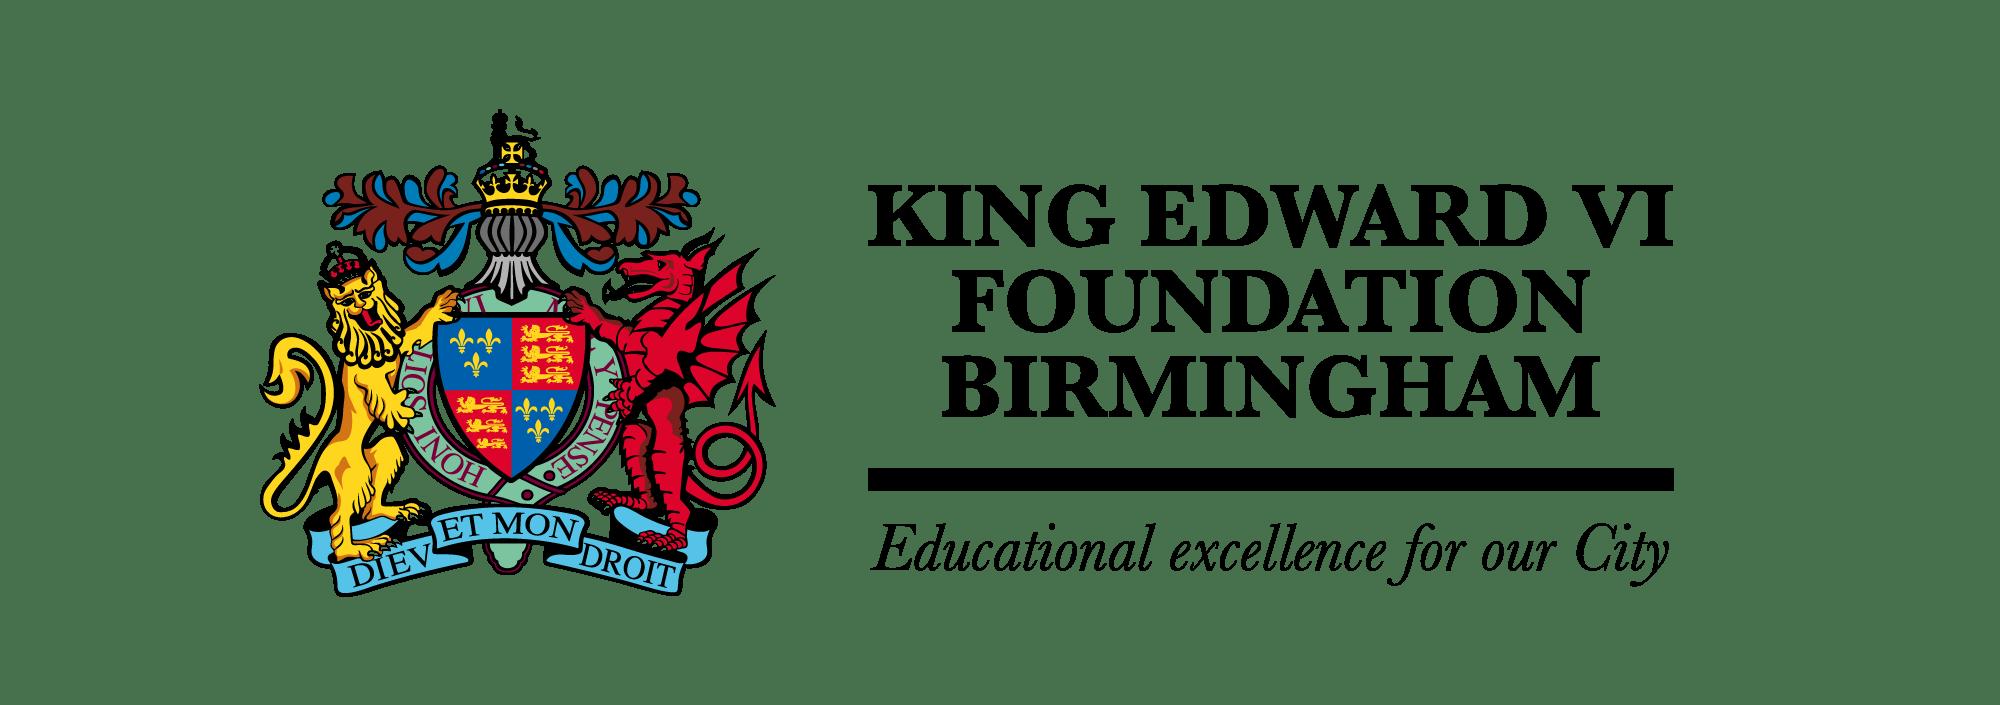 King Edward VI Foundation Logo